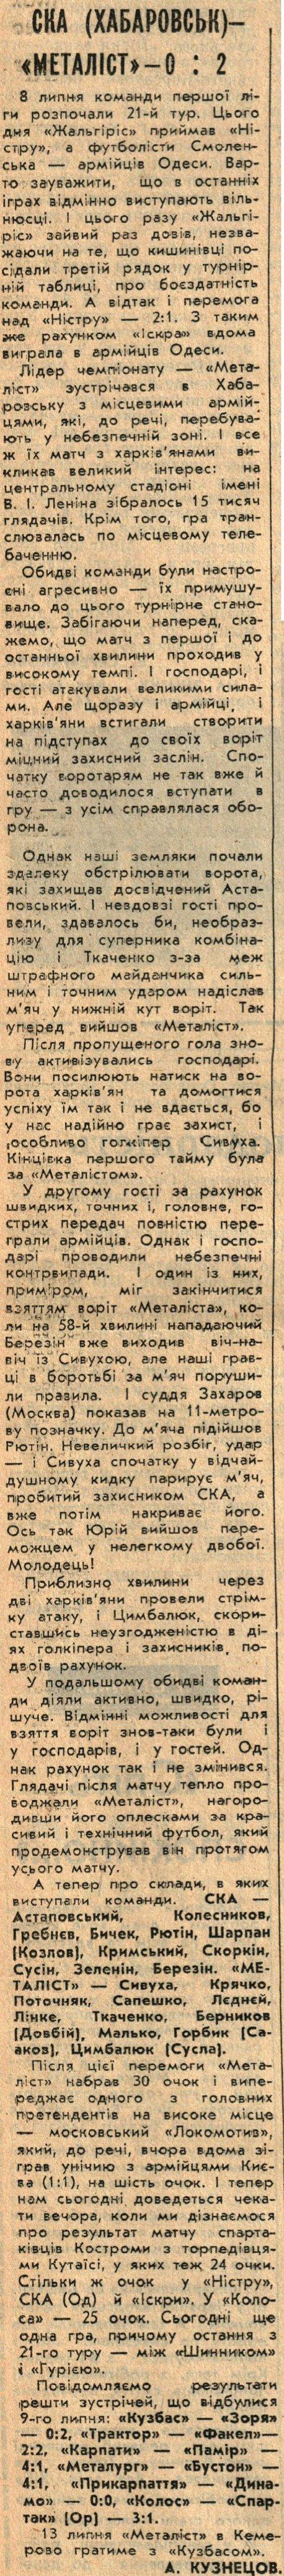 [Изображение: 1981-07-10_SKA(Hab)-MKh_0-2.jpg]